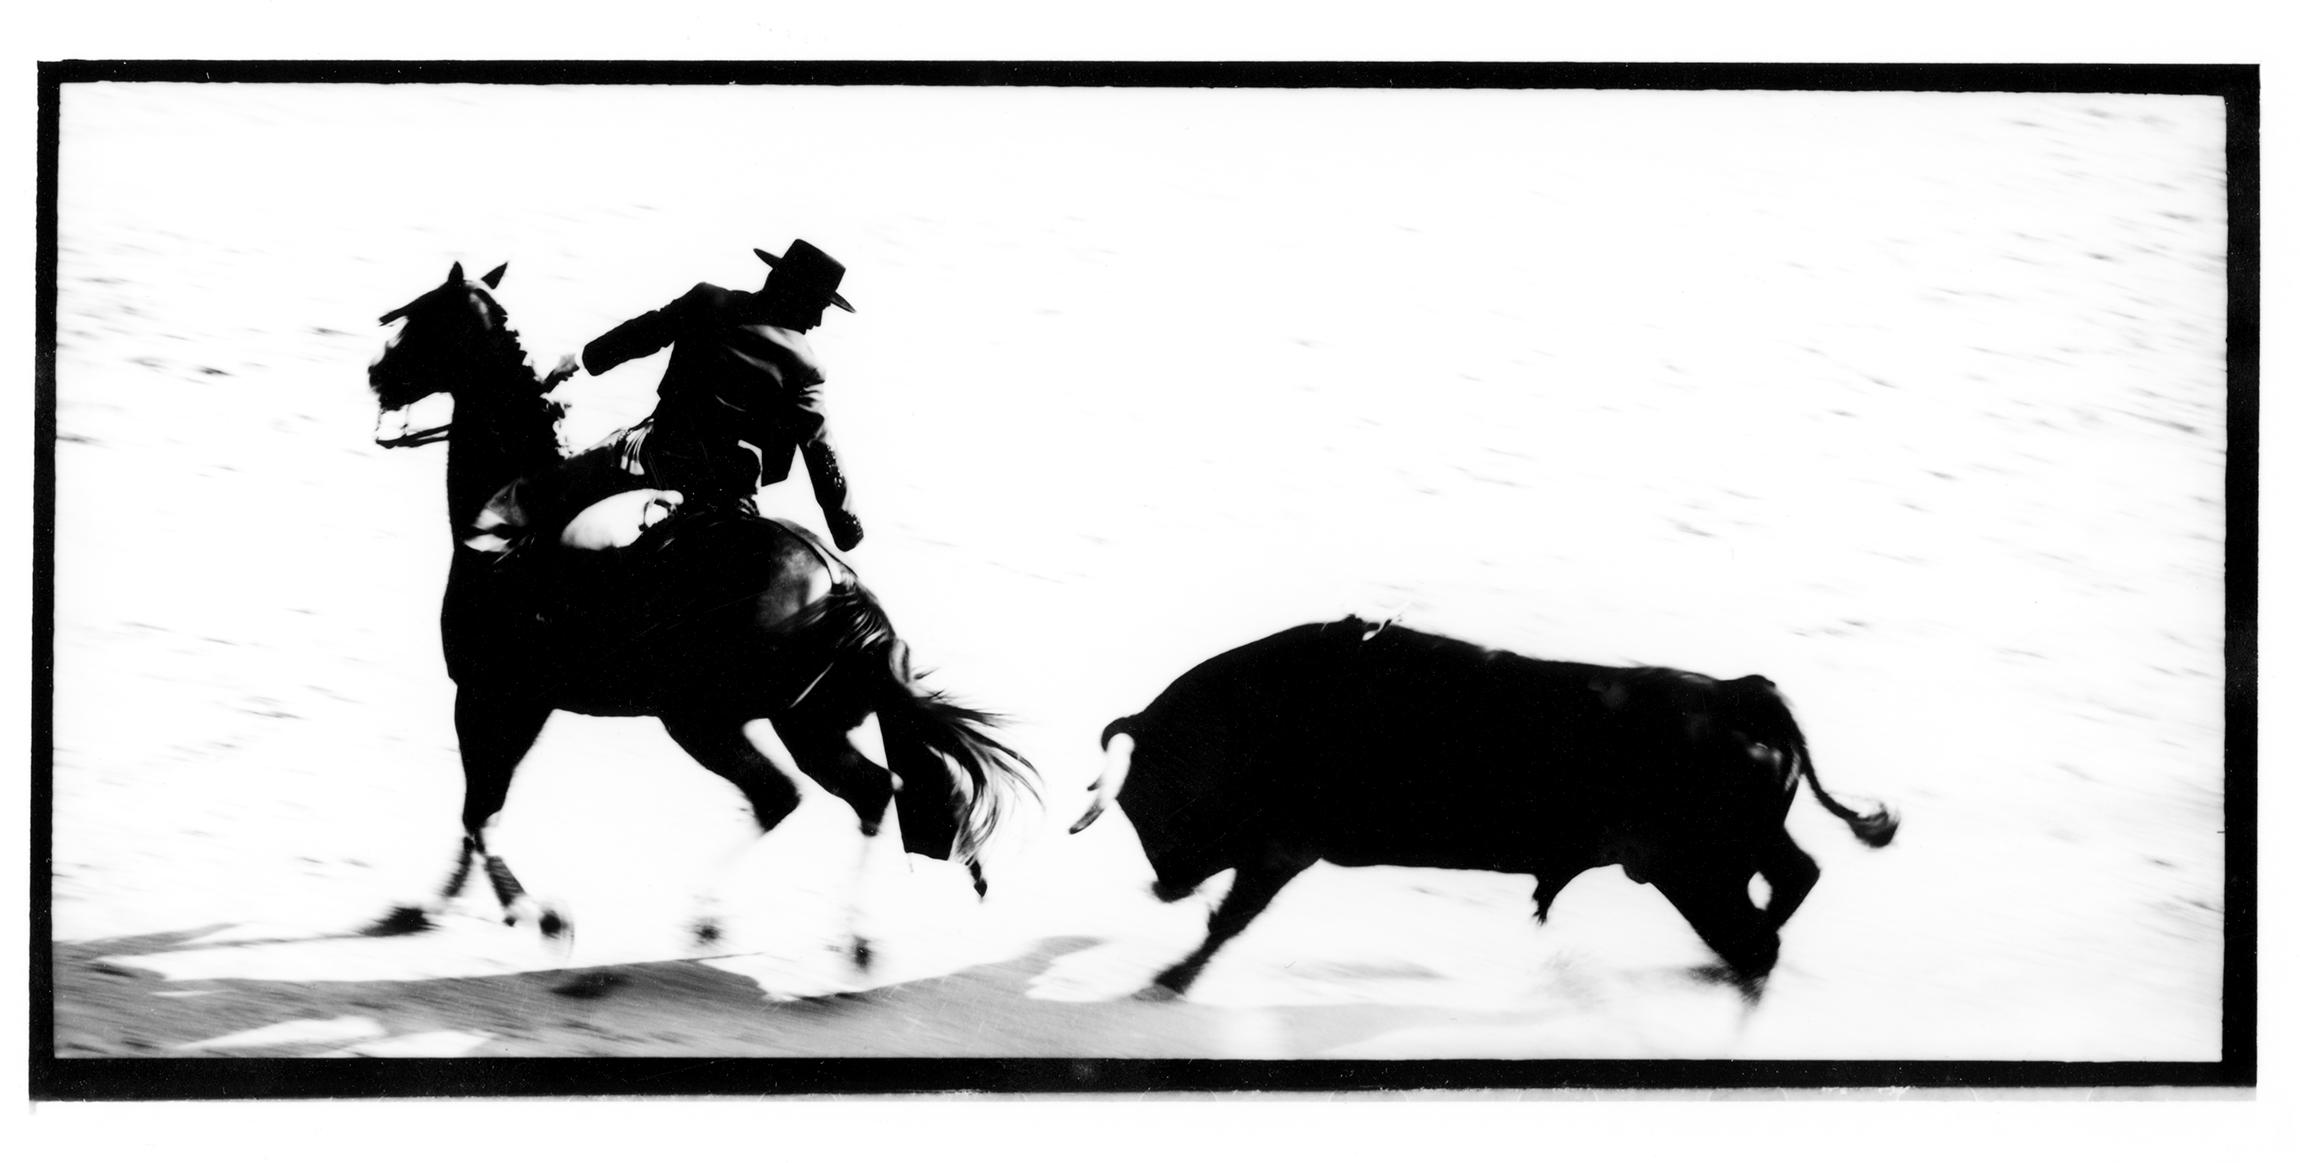 Rejoneador, Valencia, 1992